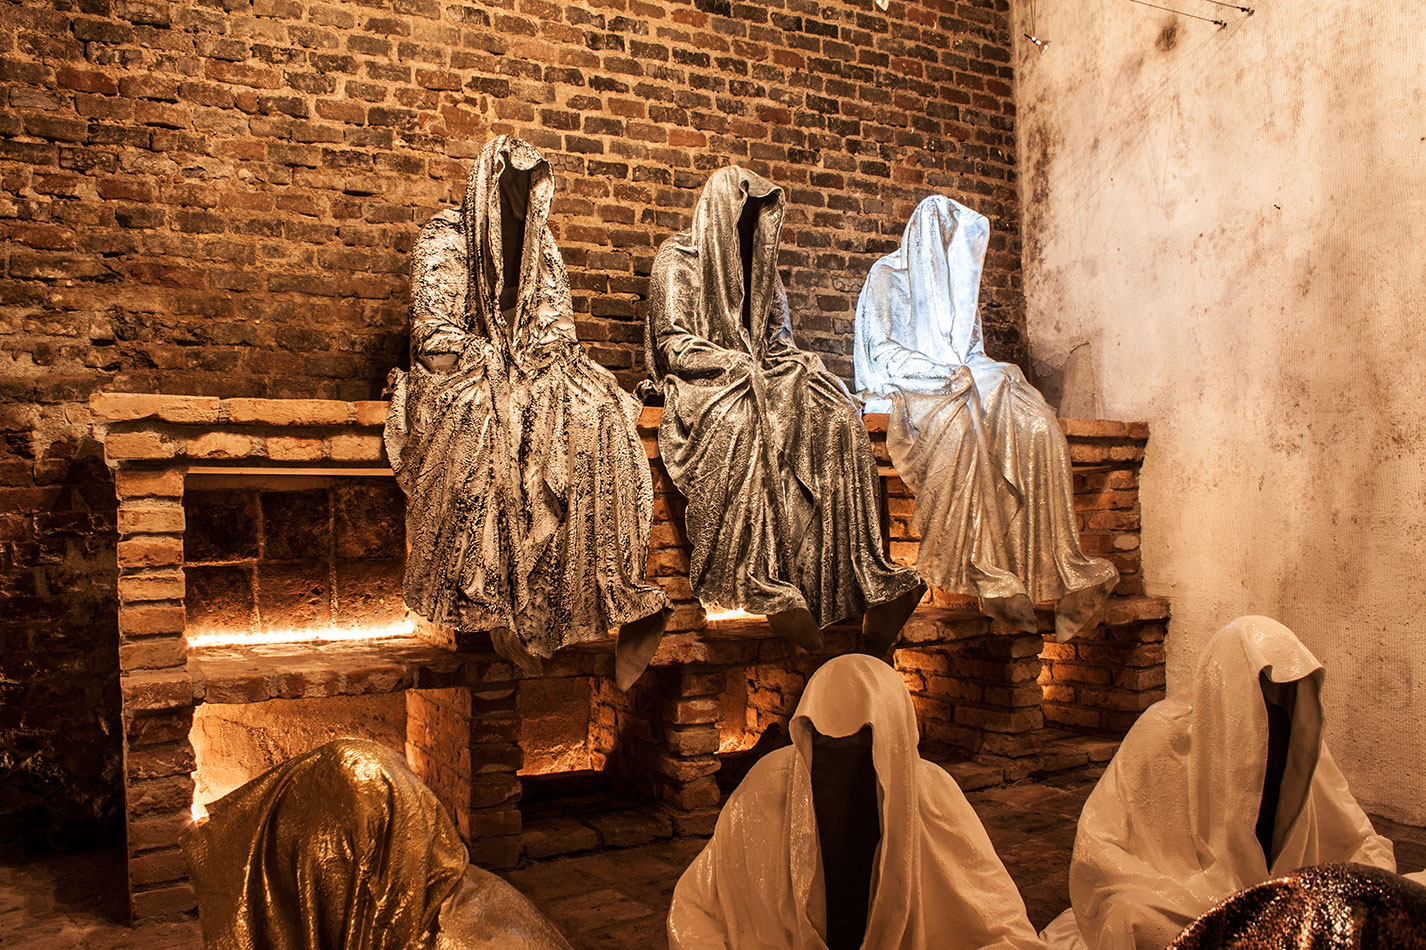 wine-cellar-galerie-artdealer--freller-guardians-of-time-manfred-kili-kielnhofer-contemporary-art-arts-light-design-sculpture-antique-show-statue-7906